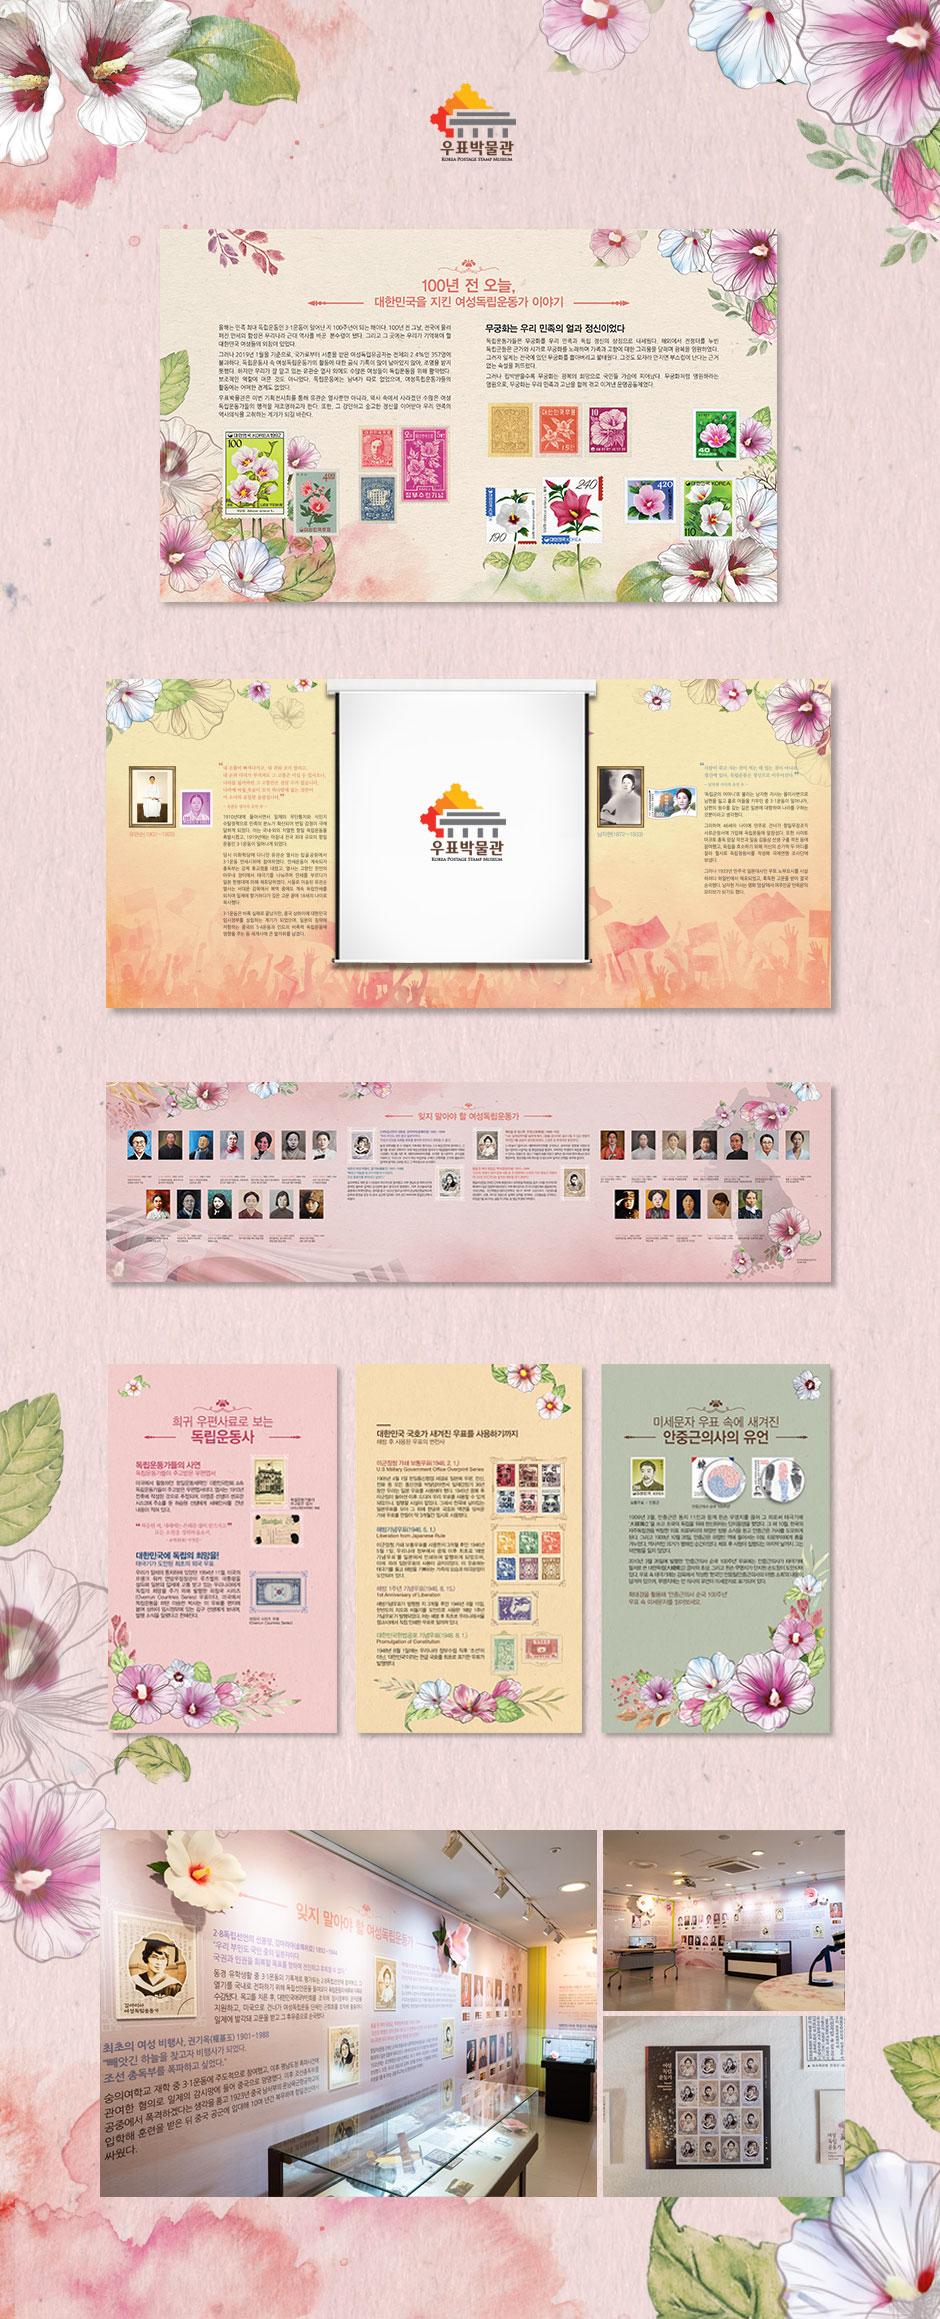 2019_Korea-Postal-Service-Agency-2019-Female-Independence-Activists-Stamps-history-exhibition-banner-design